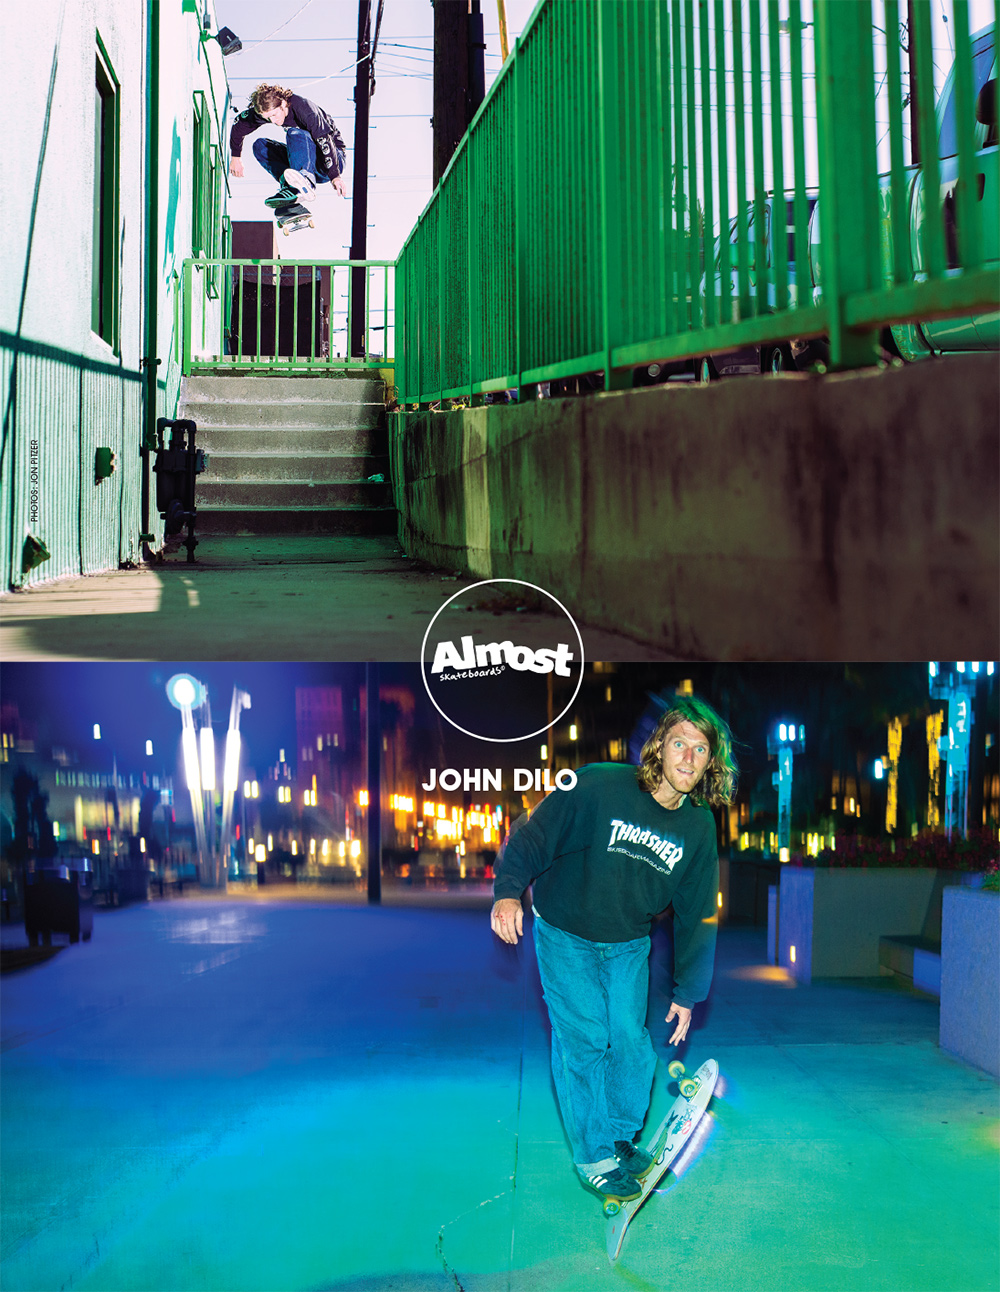 Almost_Skateboards_John_Dilo_Thrasher_Ad.jpg